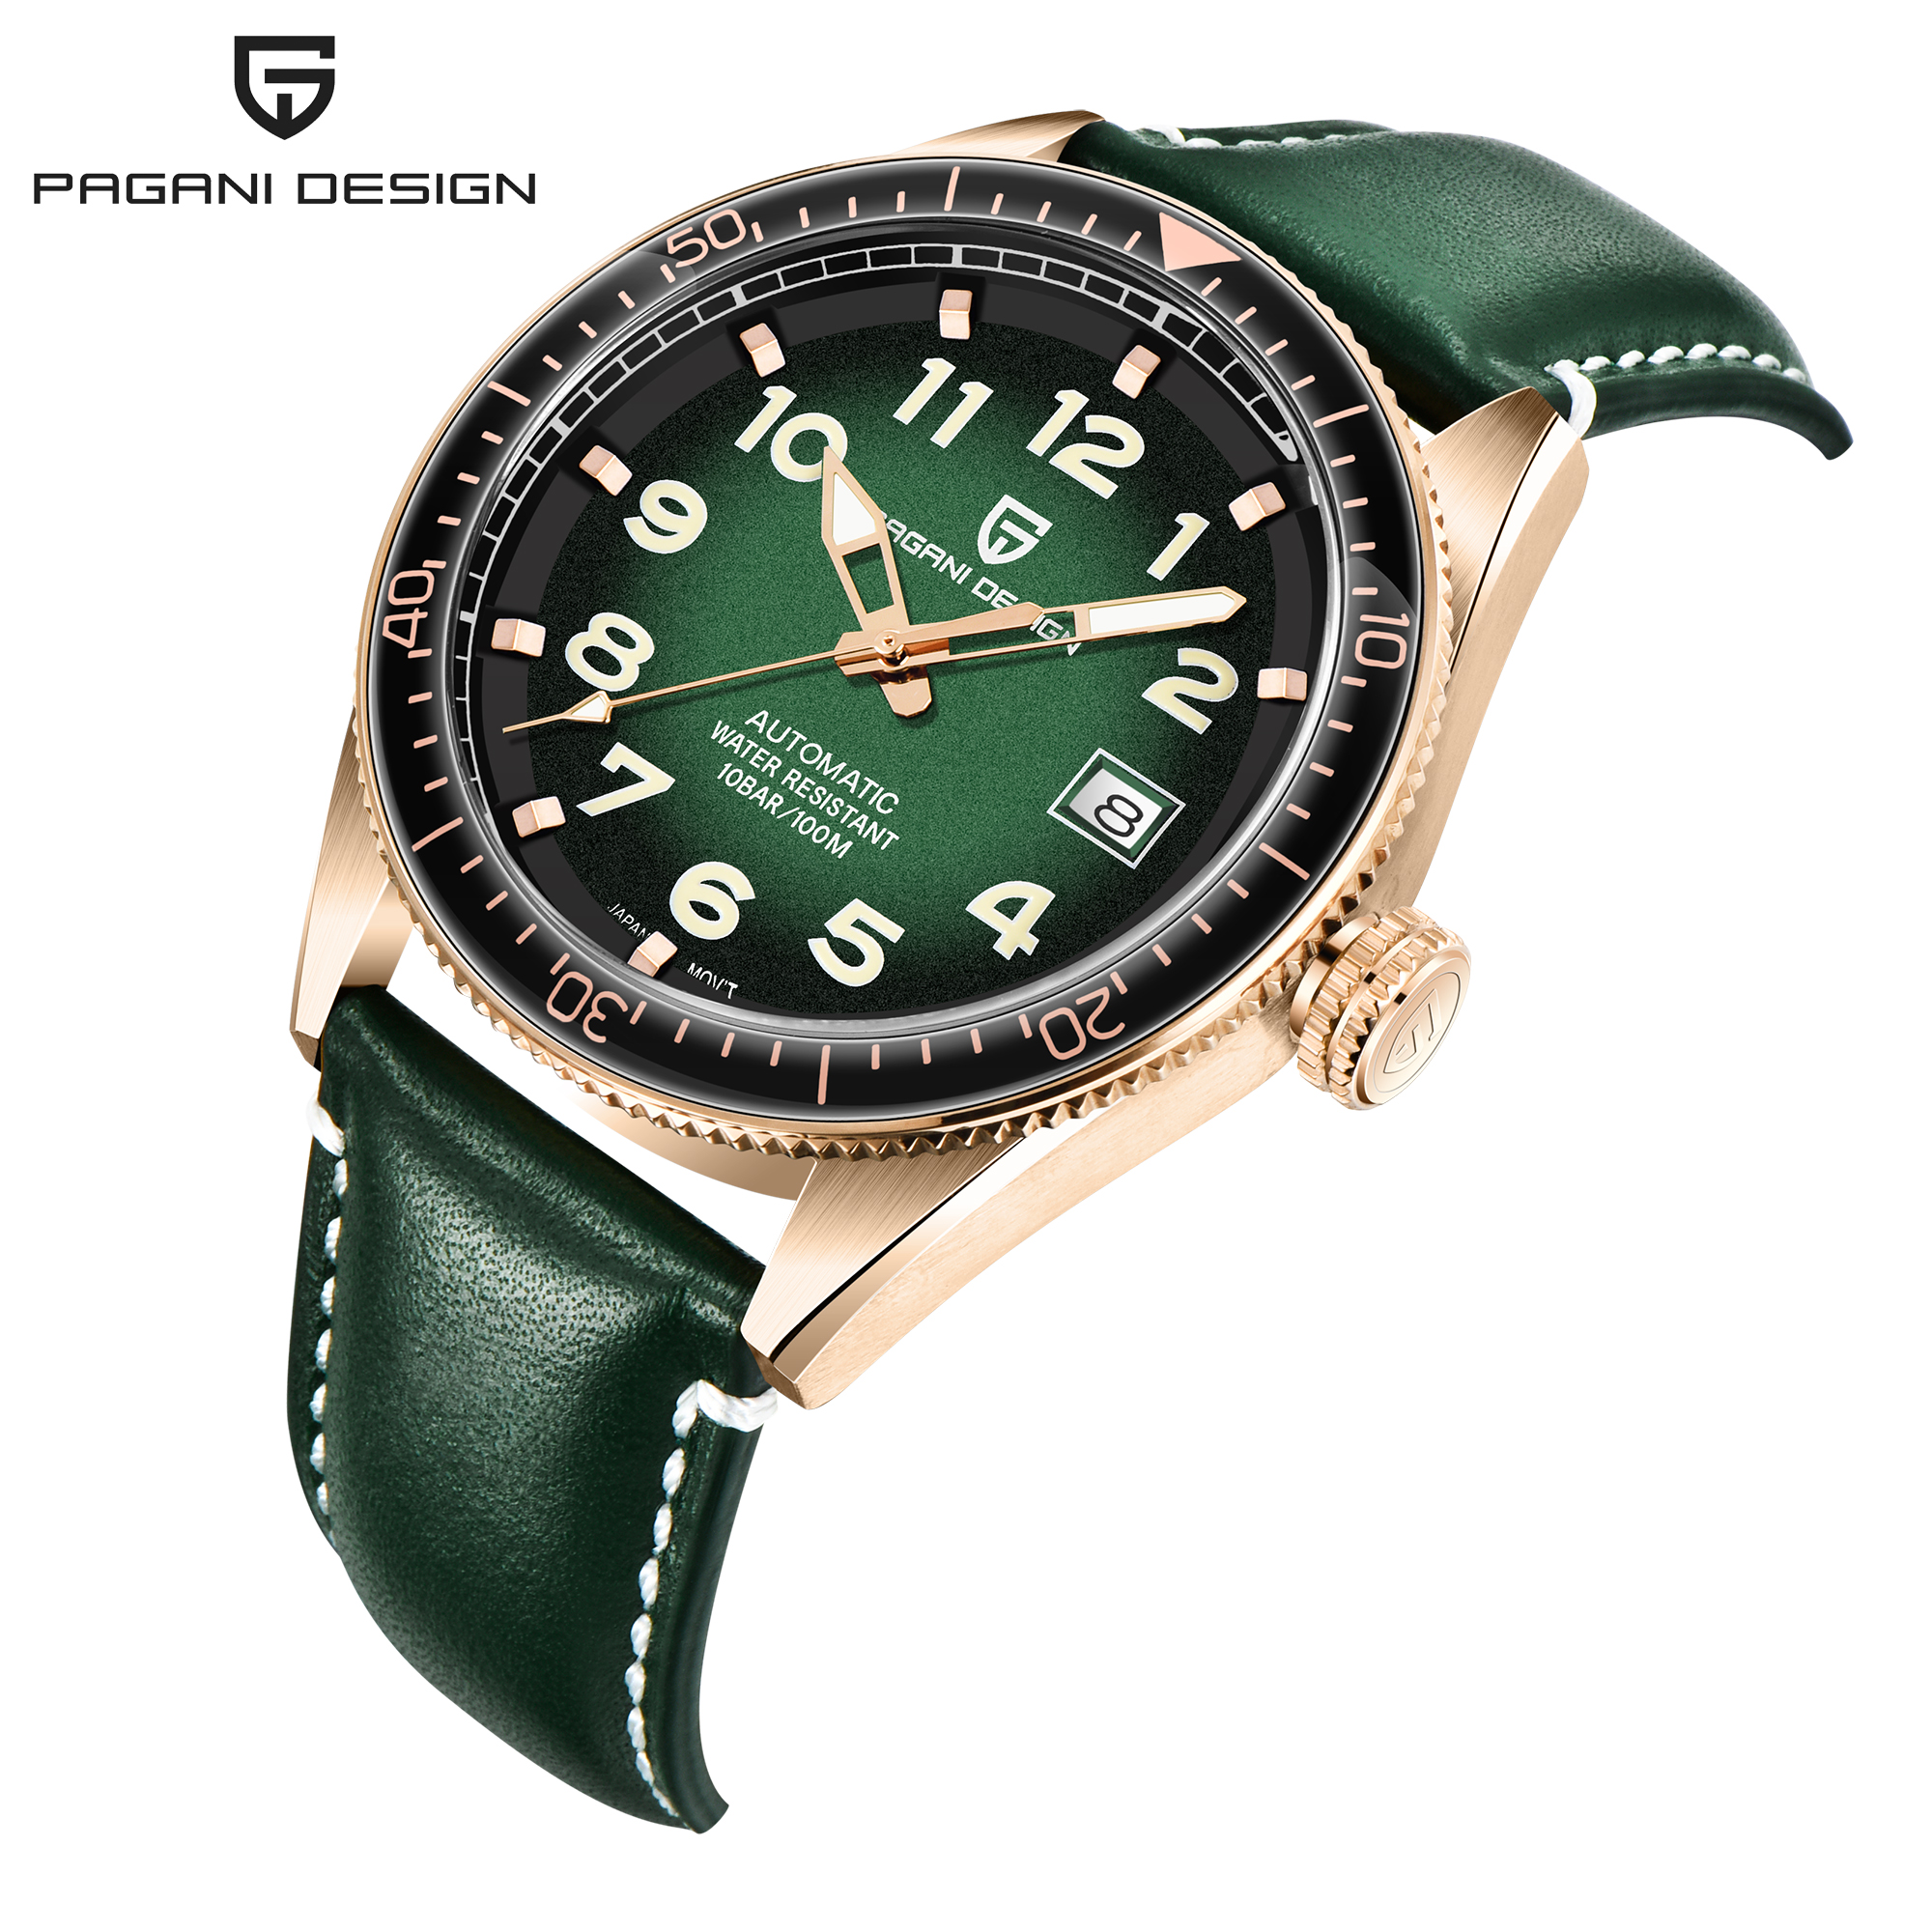 PAGANI design Luxury exquisite watch men's mechanical watch men's watch popular fashion night light waterproof men's watch 1649